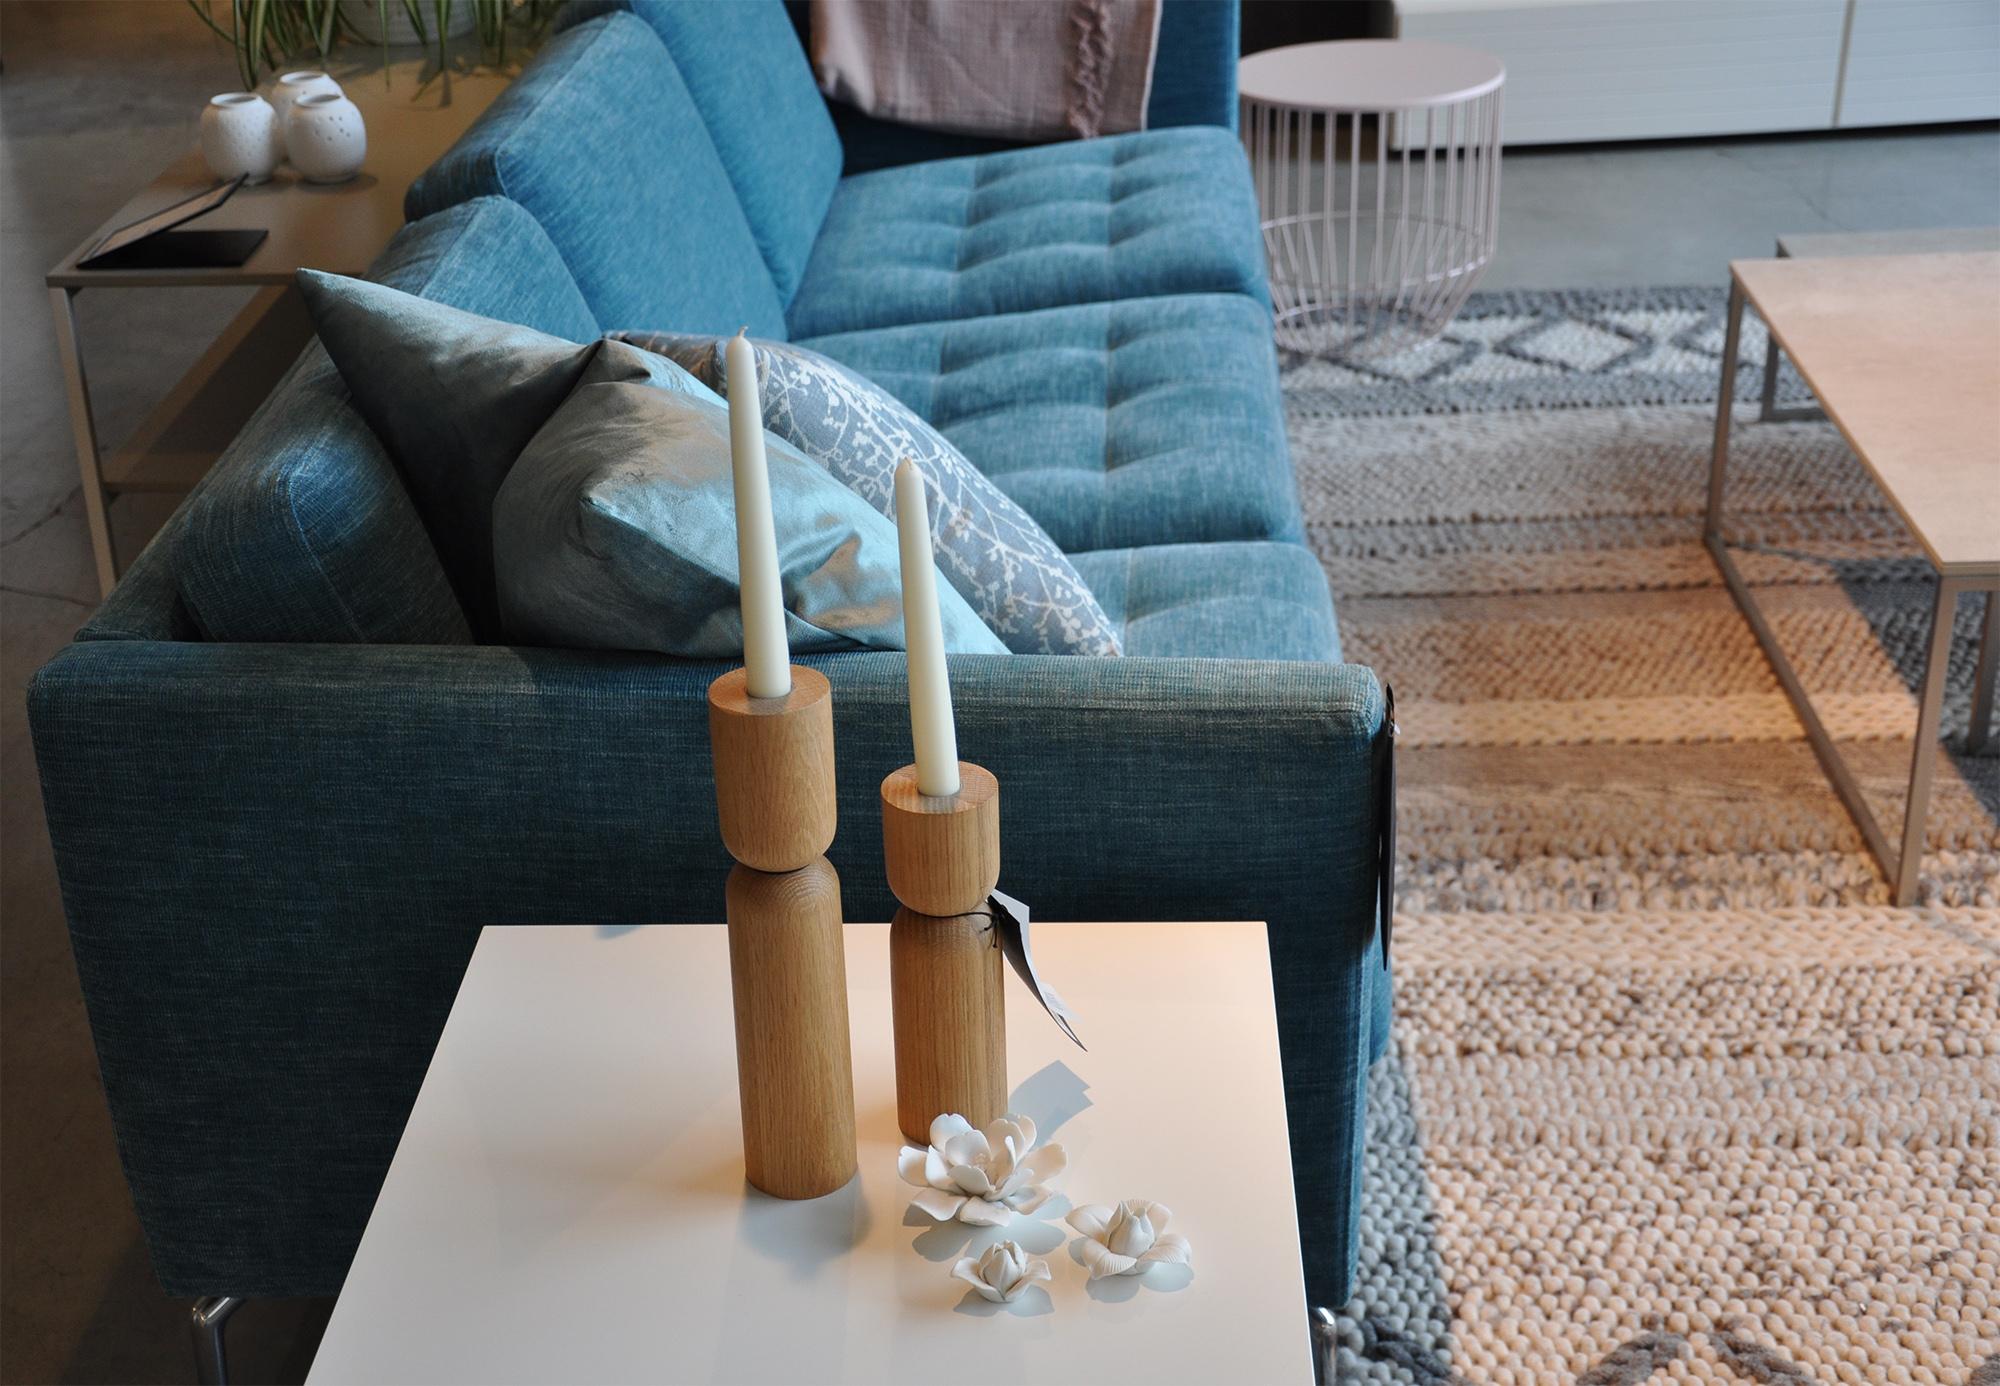 Palencia rug , Up & Down candlesticks,  Osaka sofa  in turquoise Napoli fabric